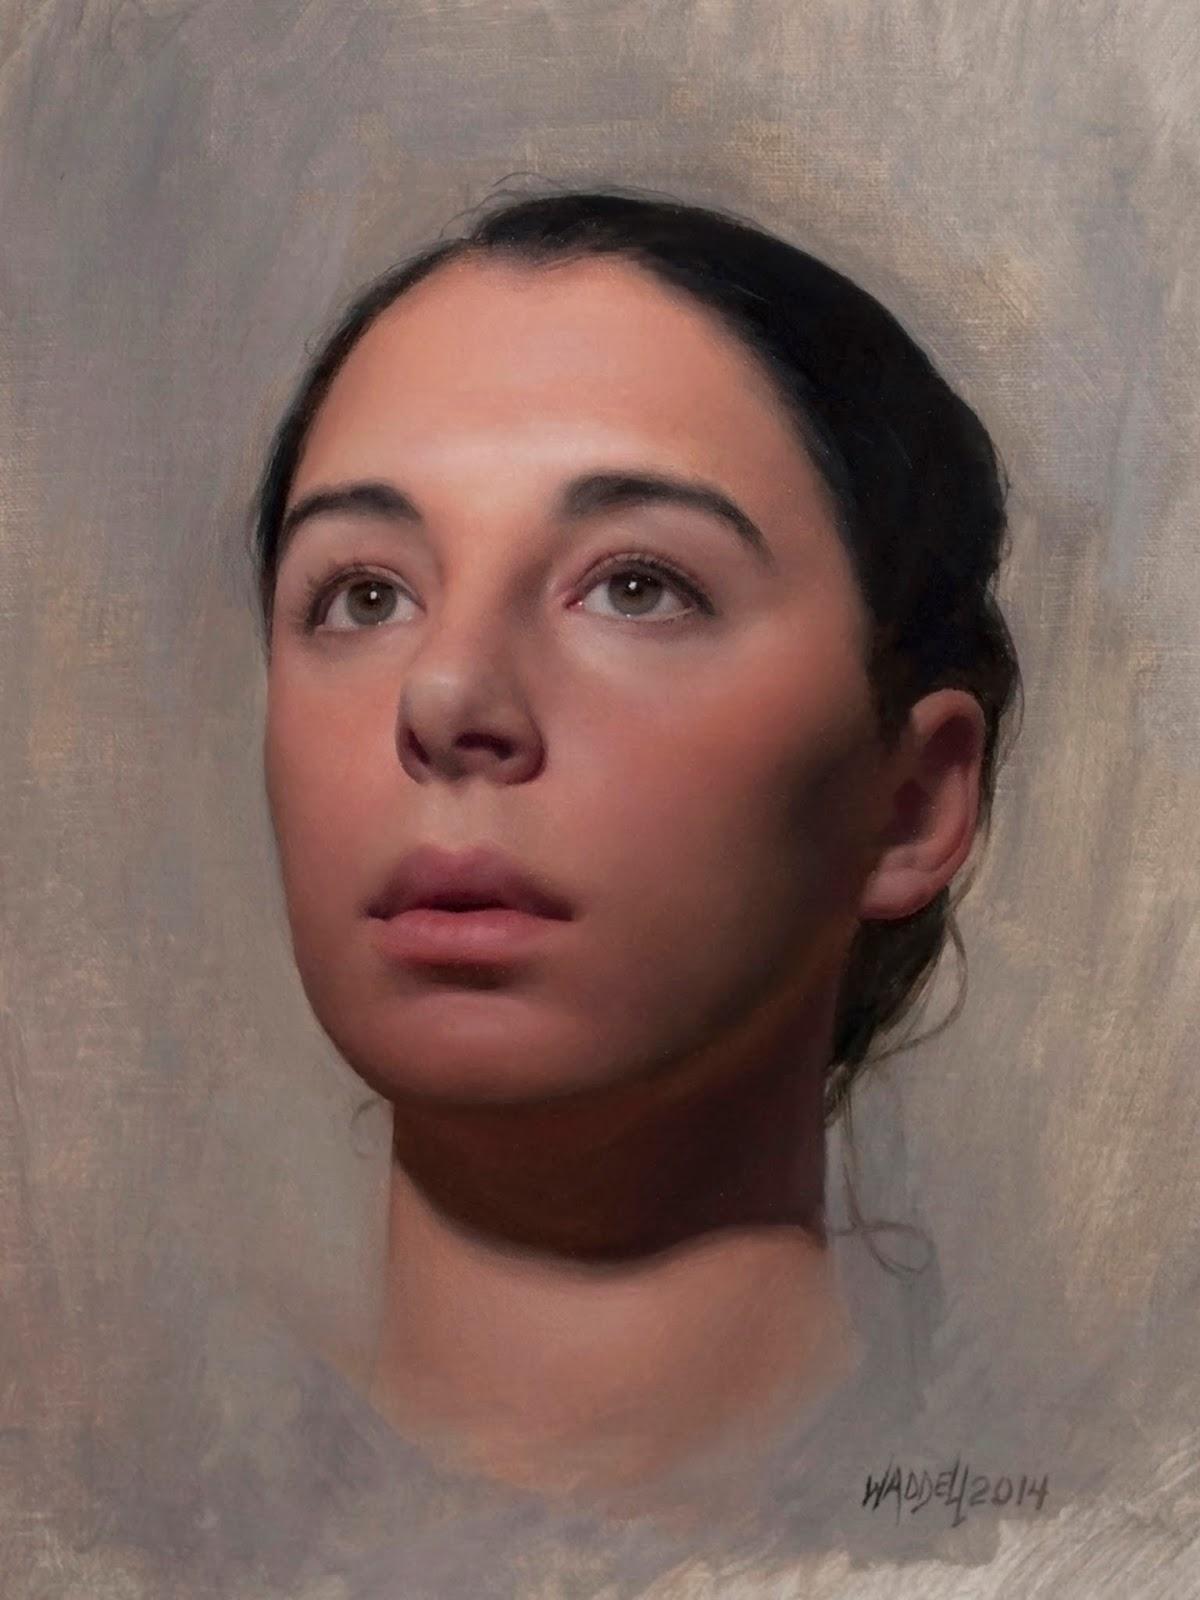 Scott Waddell's Portrait Course… WATCH FOR FREE!